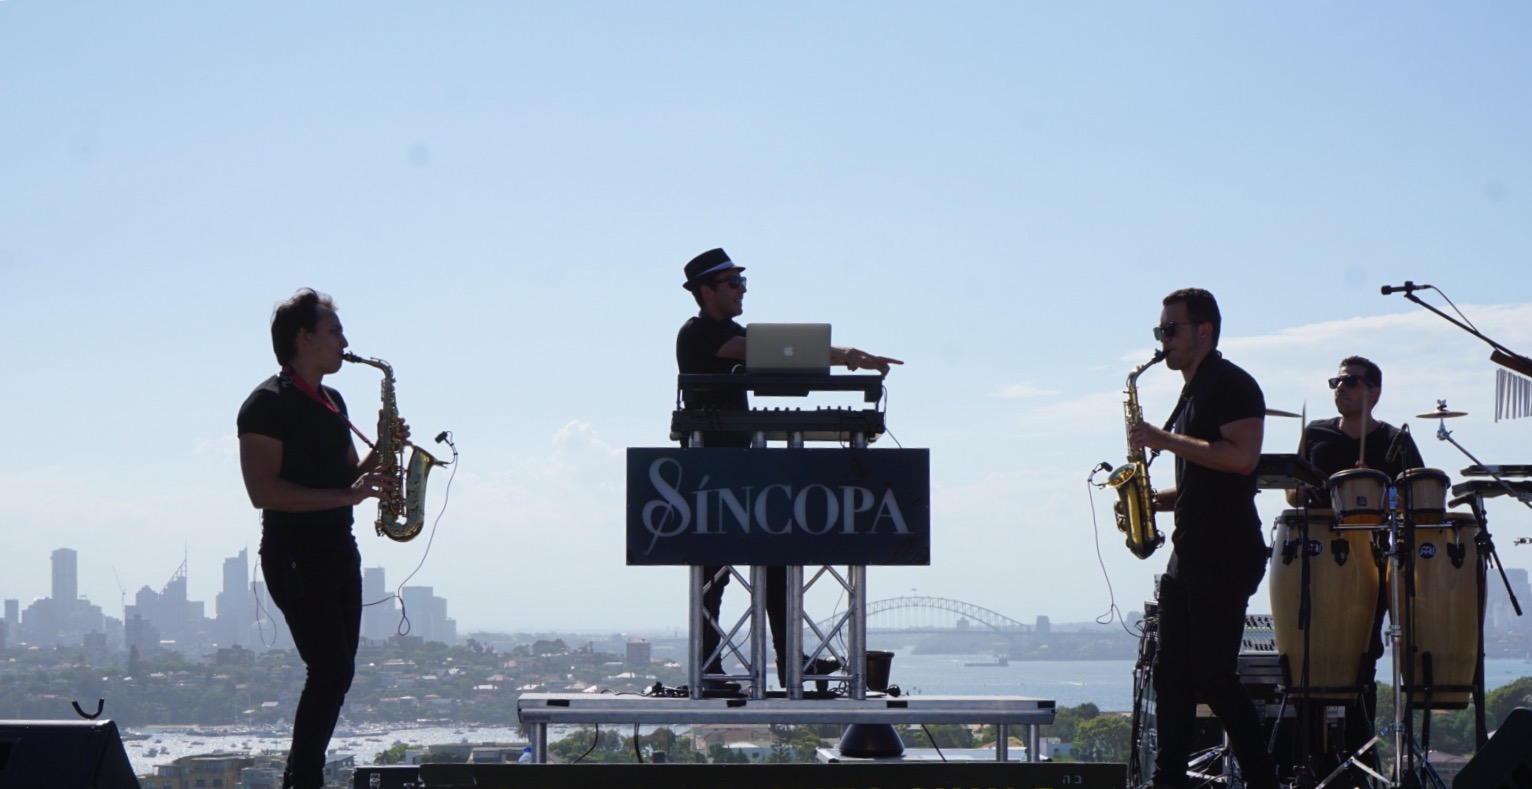 Sincopa Trio overlooking Sydney